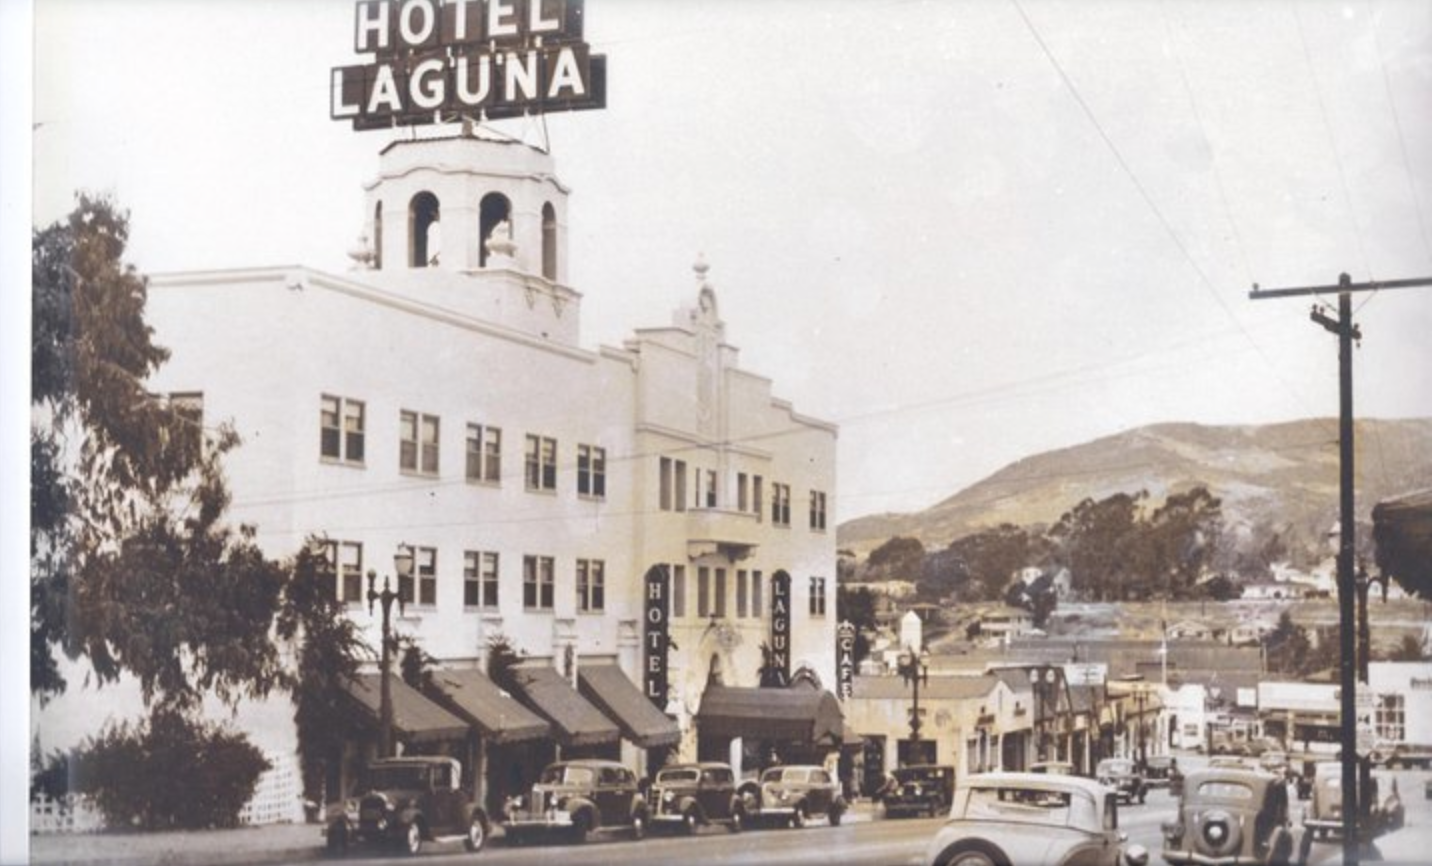 Hotel Laguna - 1930s